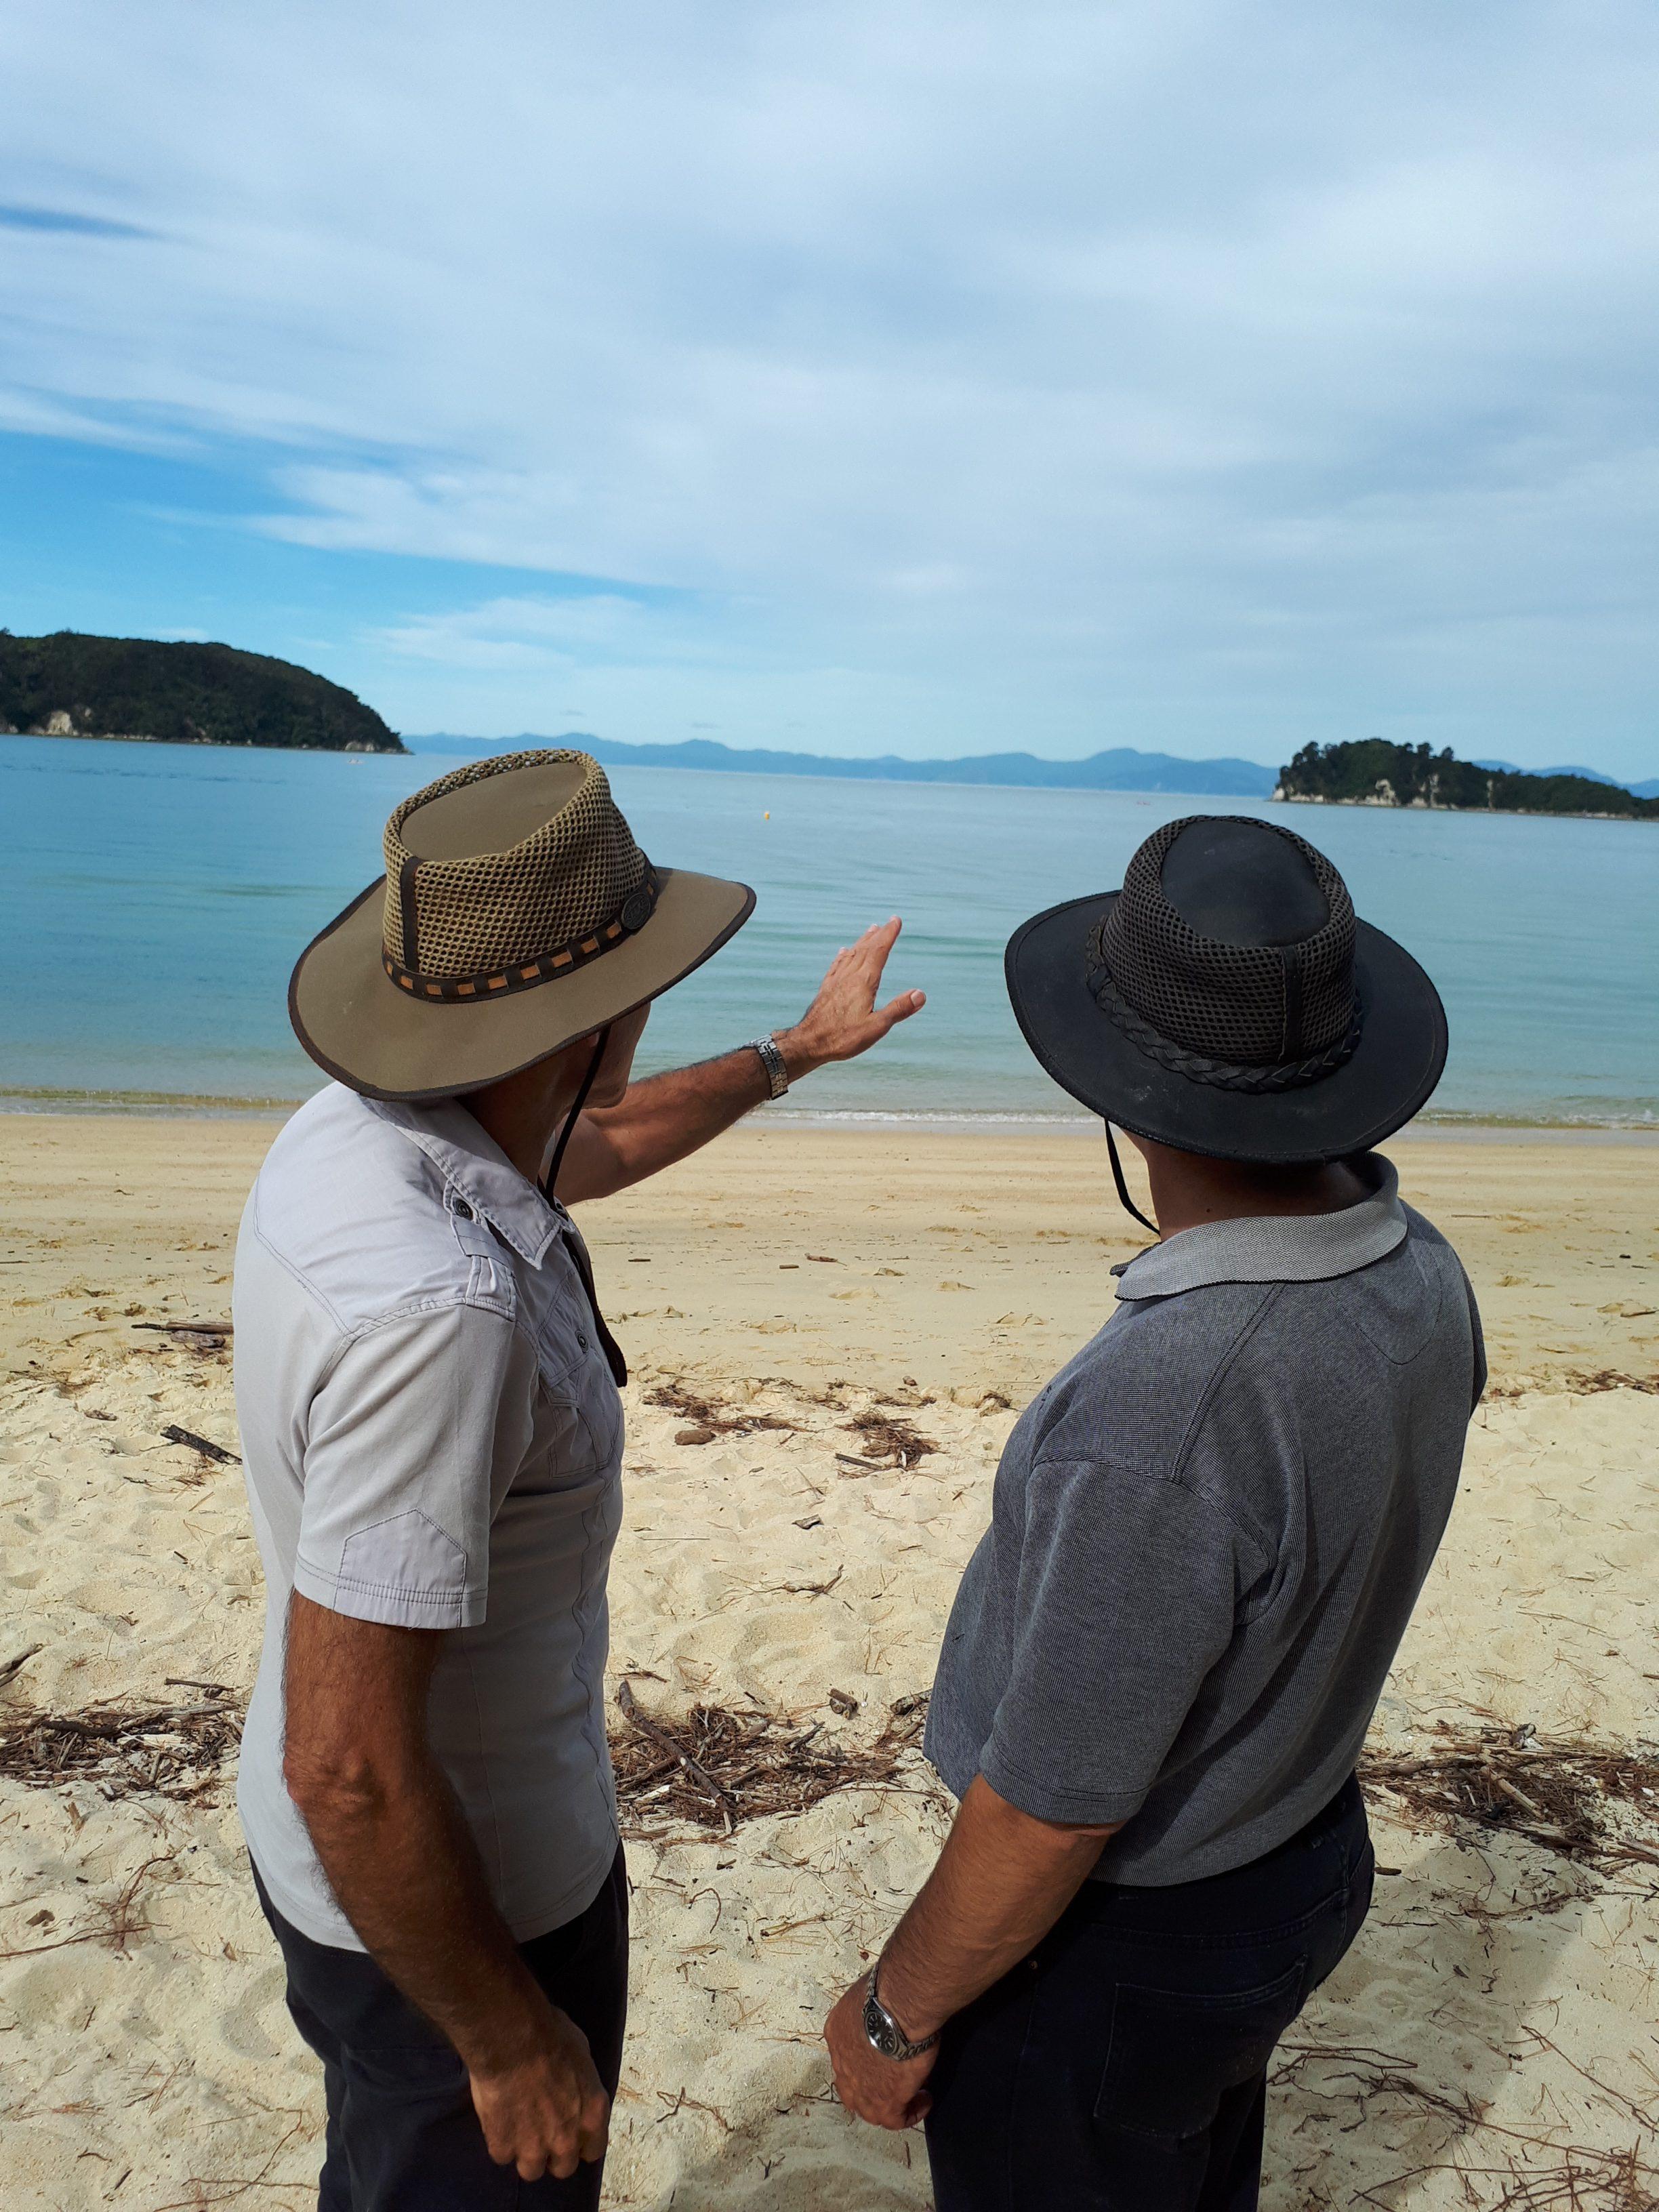 6e3d1c3d008 Khaki Summer - Selke NZ high quality handcrafted leather   fabric hats